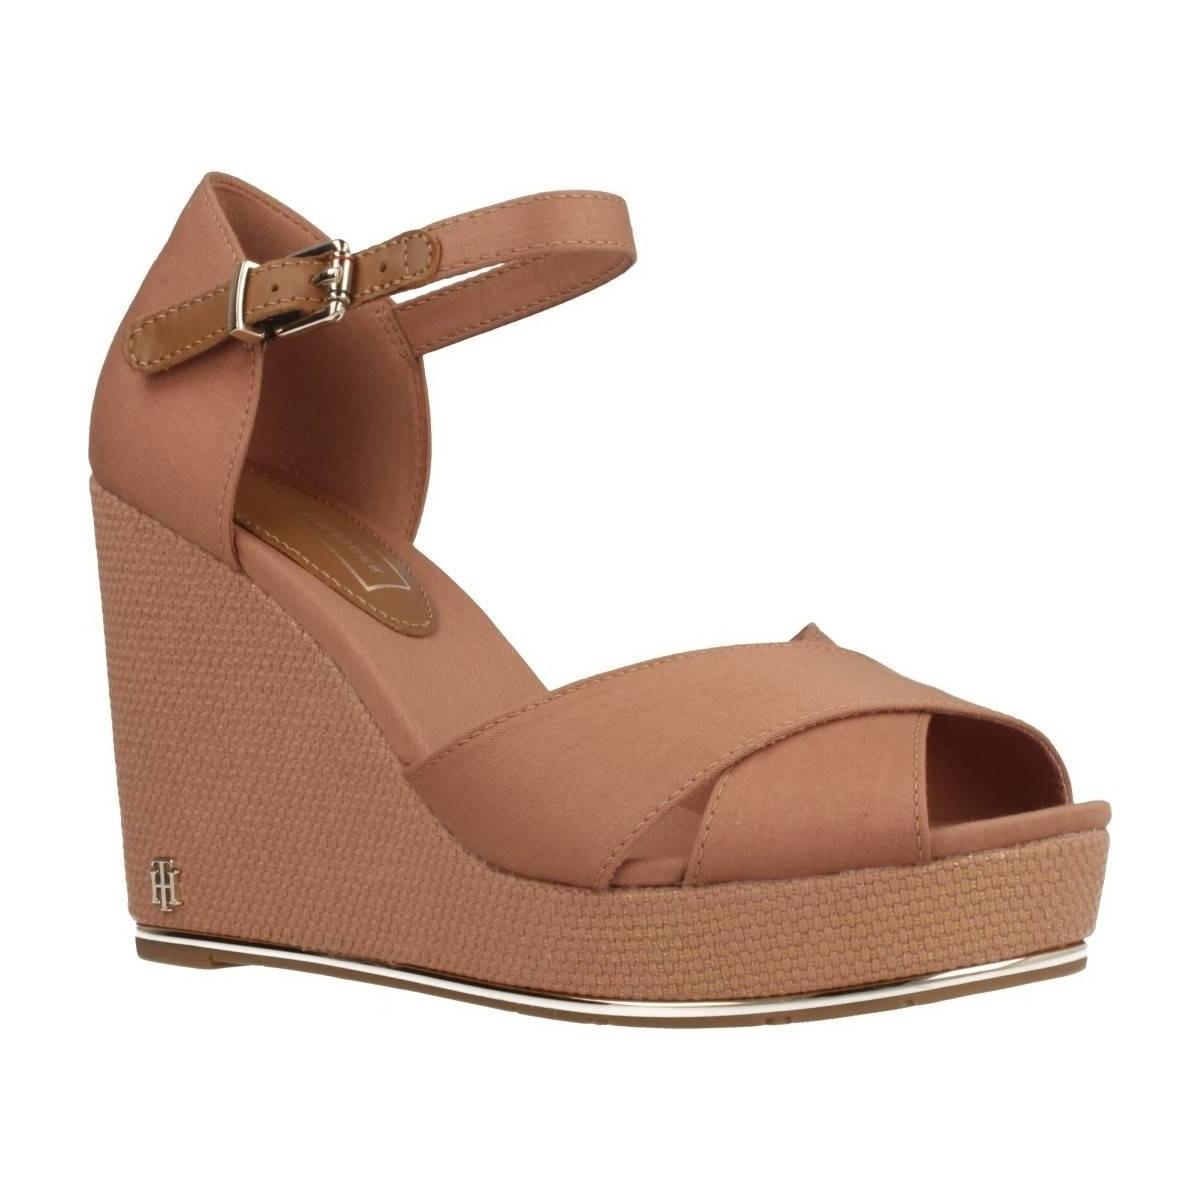 18b46cf155 Tommy Hilfiger Fw0fw04078 Women's Sandals In Brown in Brown - Lyst